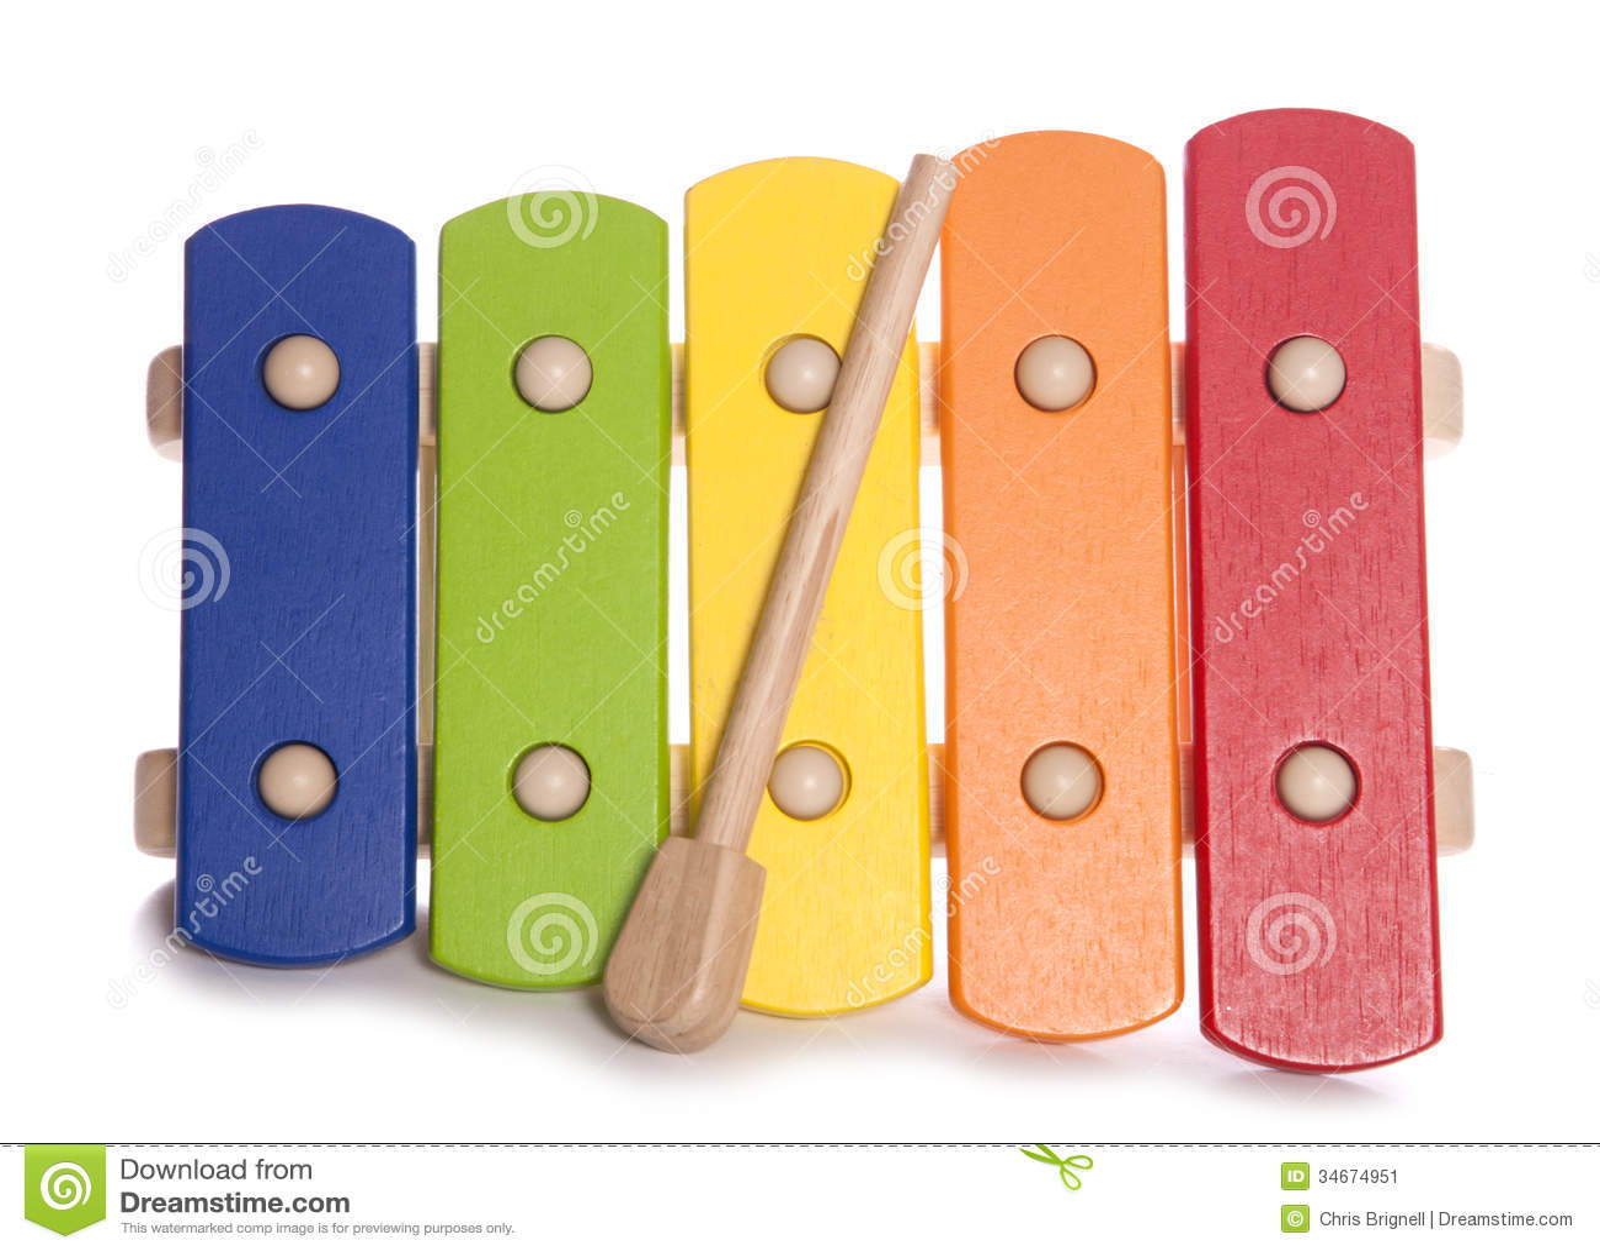 rainbow xylophone musical instrument stock image image xylophone clipart png xylophone clip art free